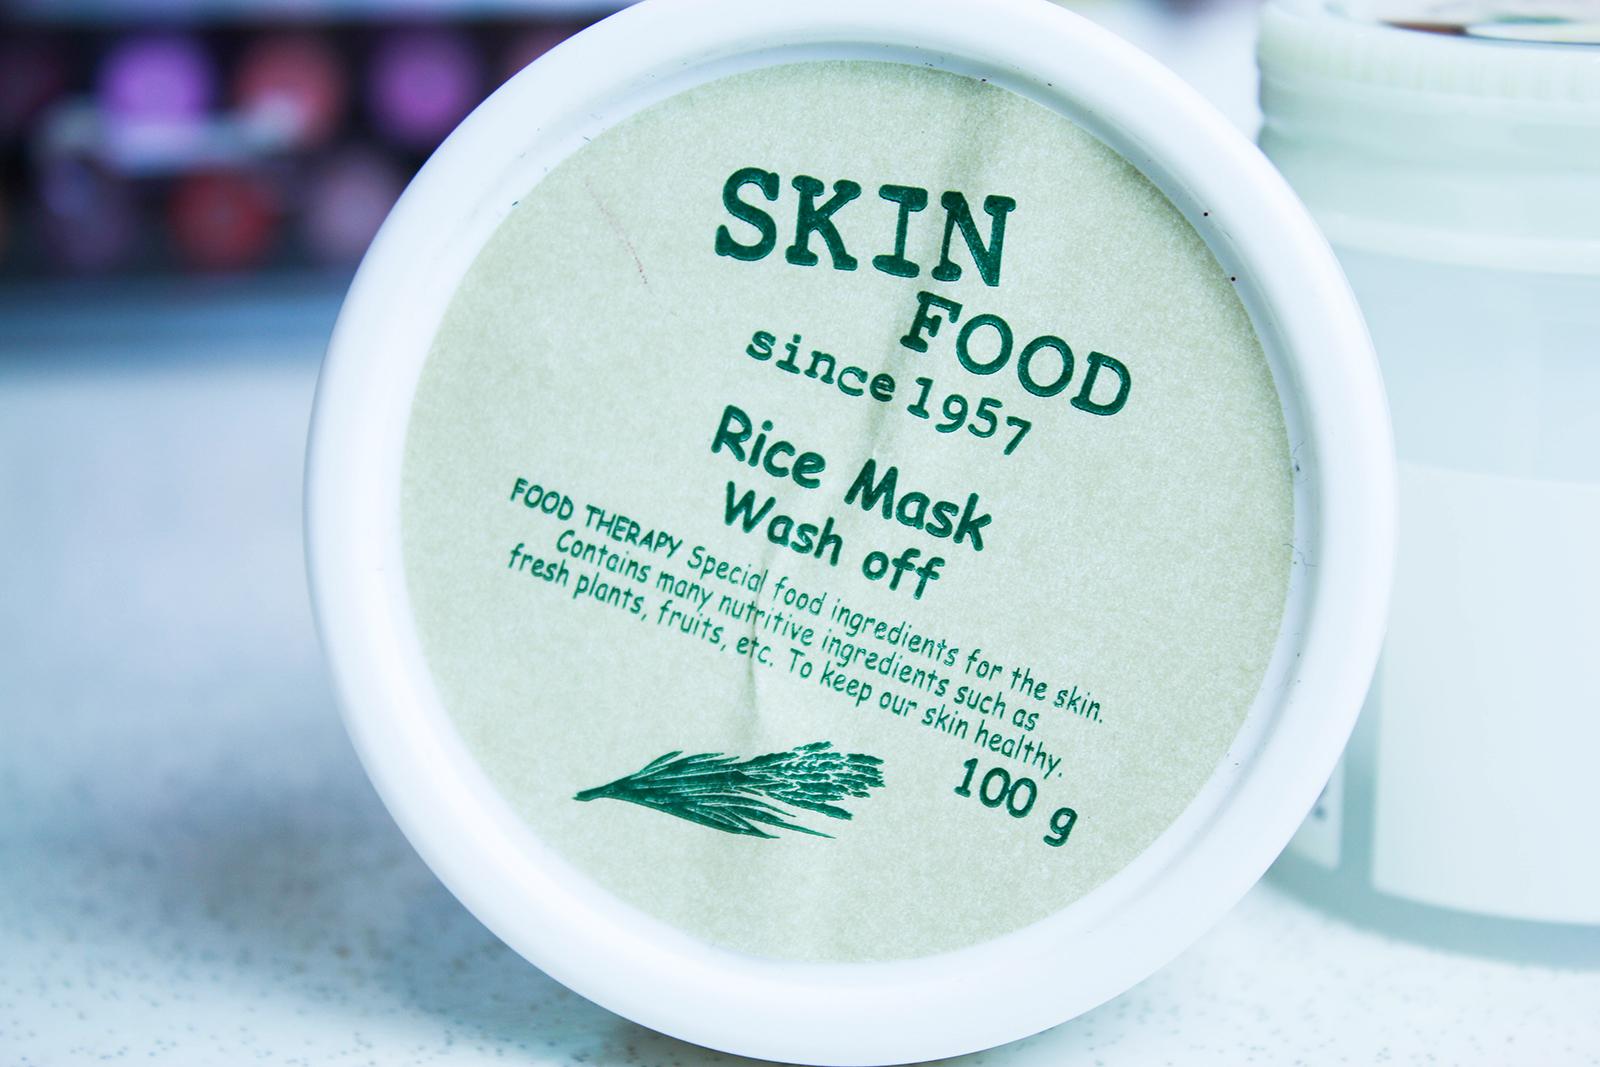 Skinfood Rice Mask Wash Off_1